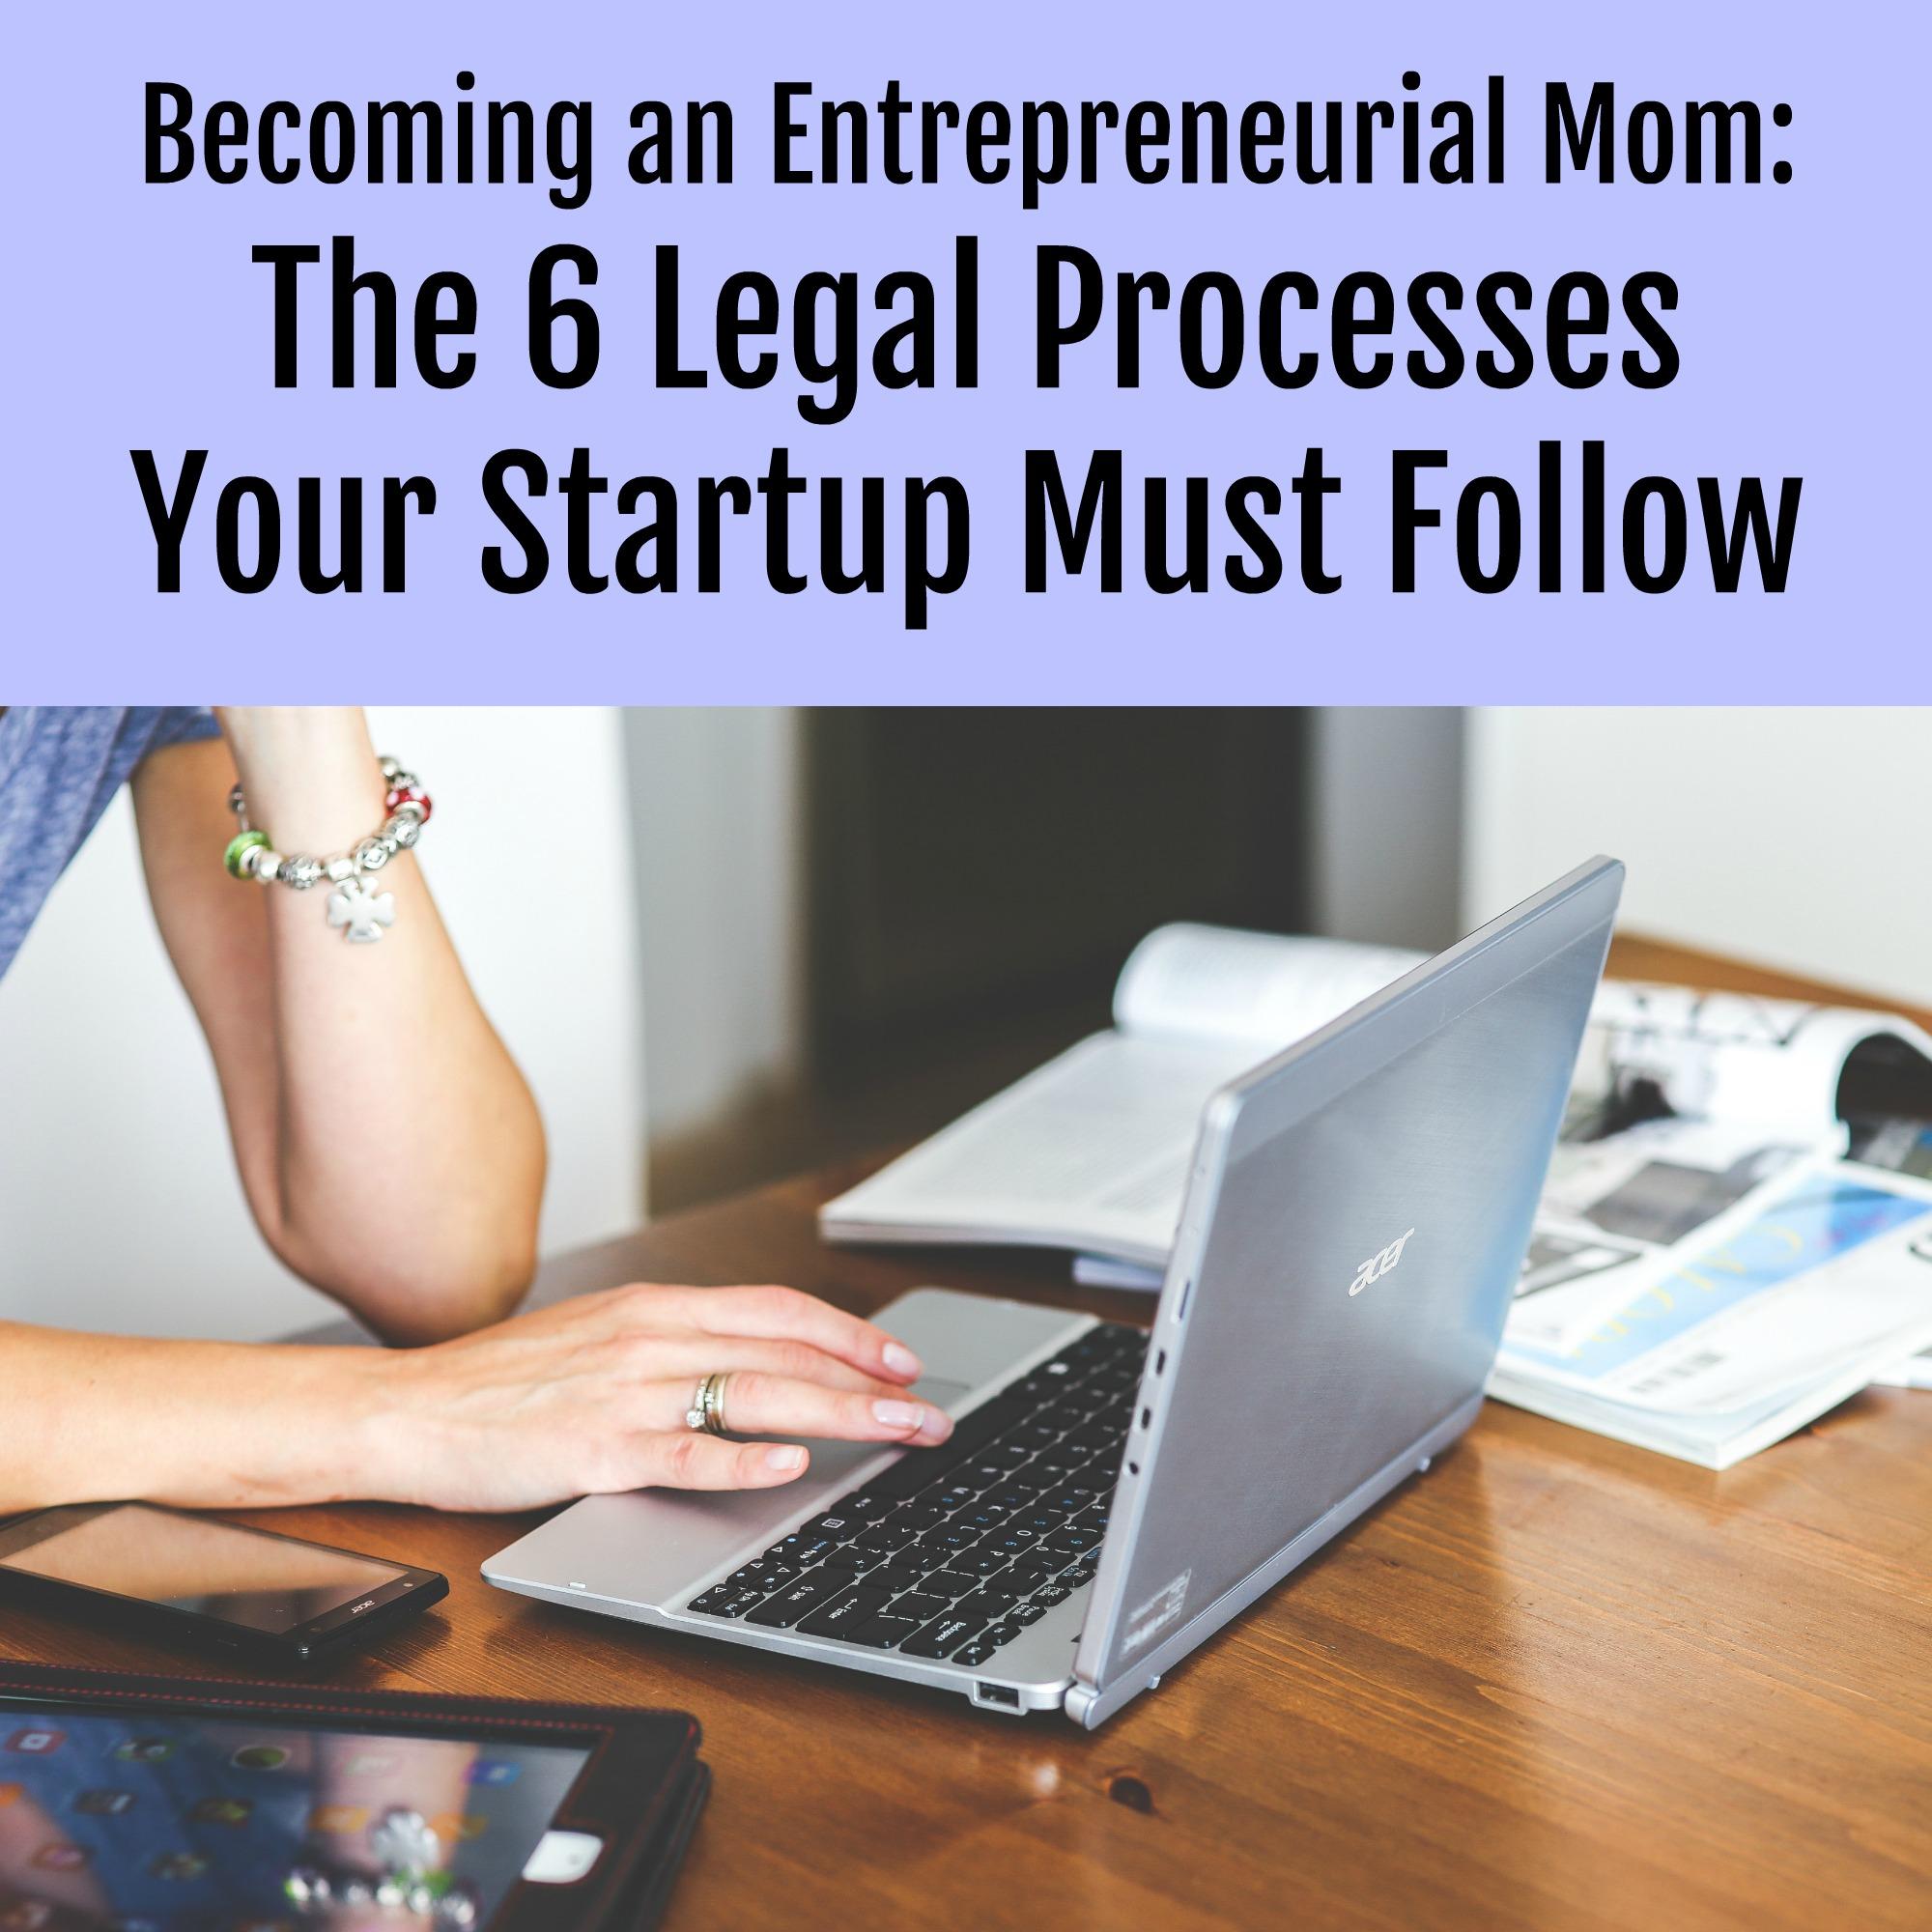 Entrepreneurial Moms